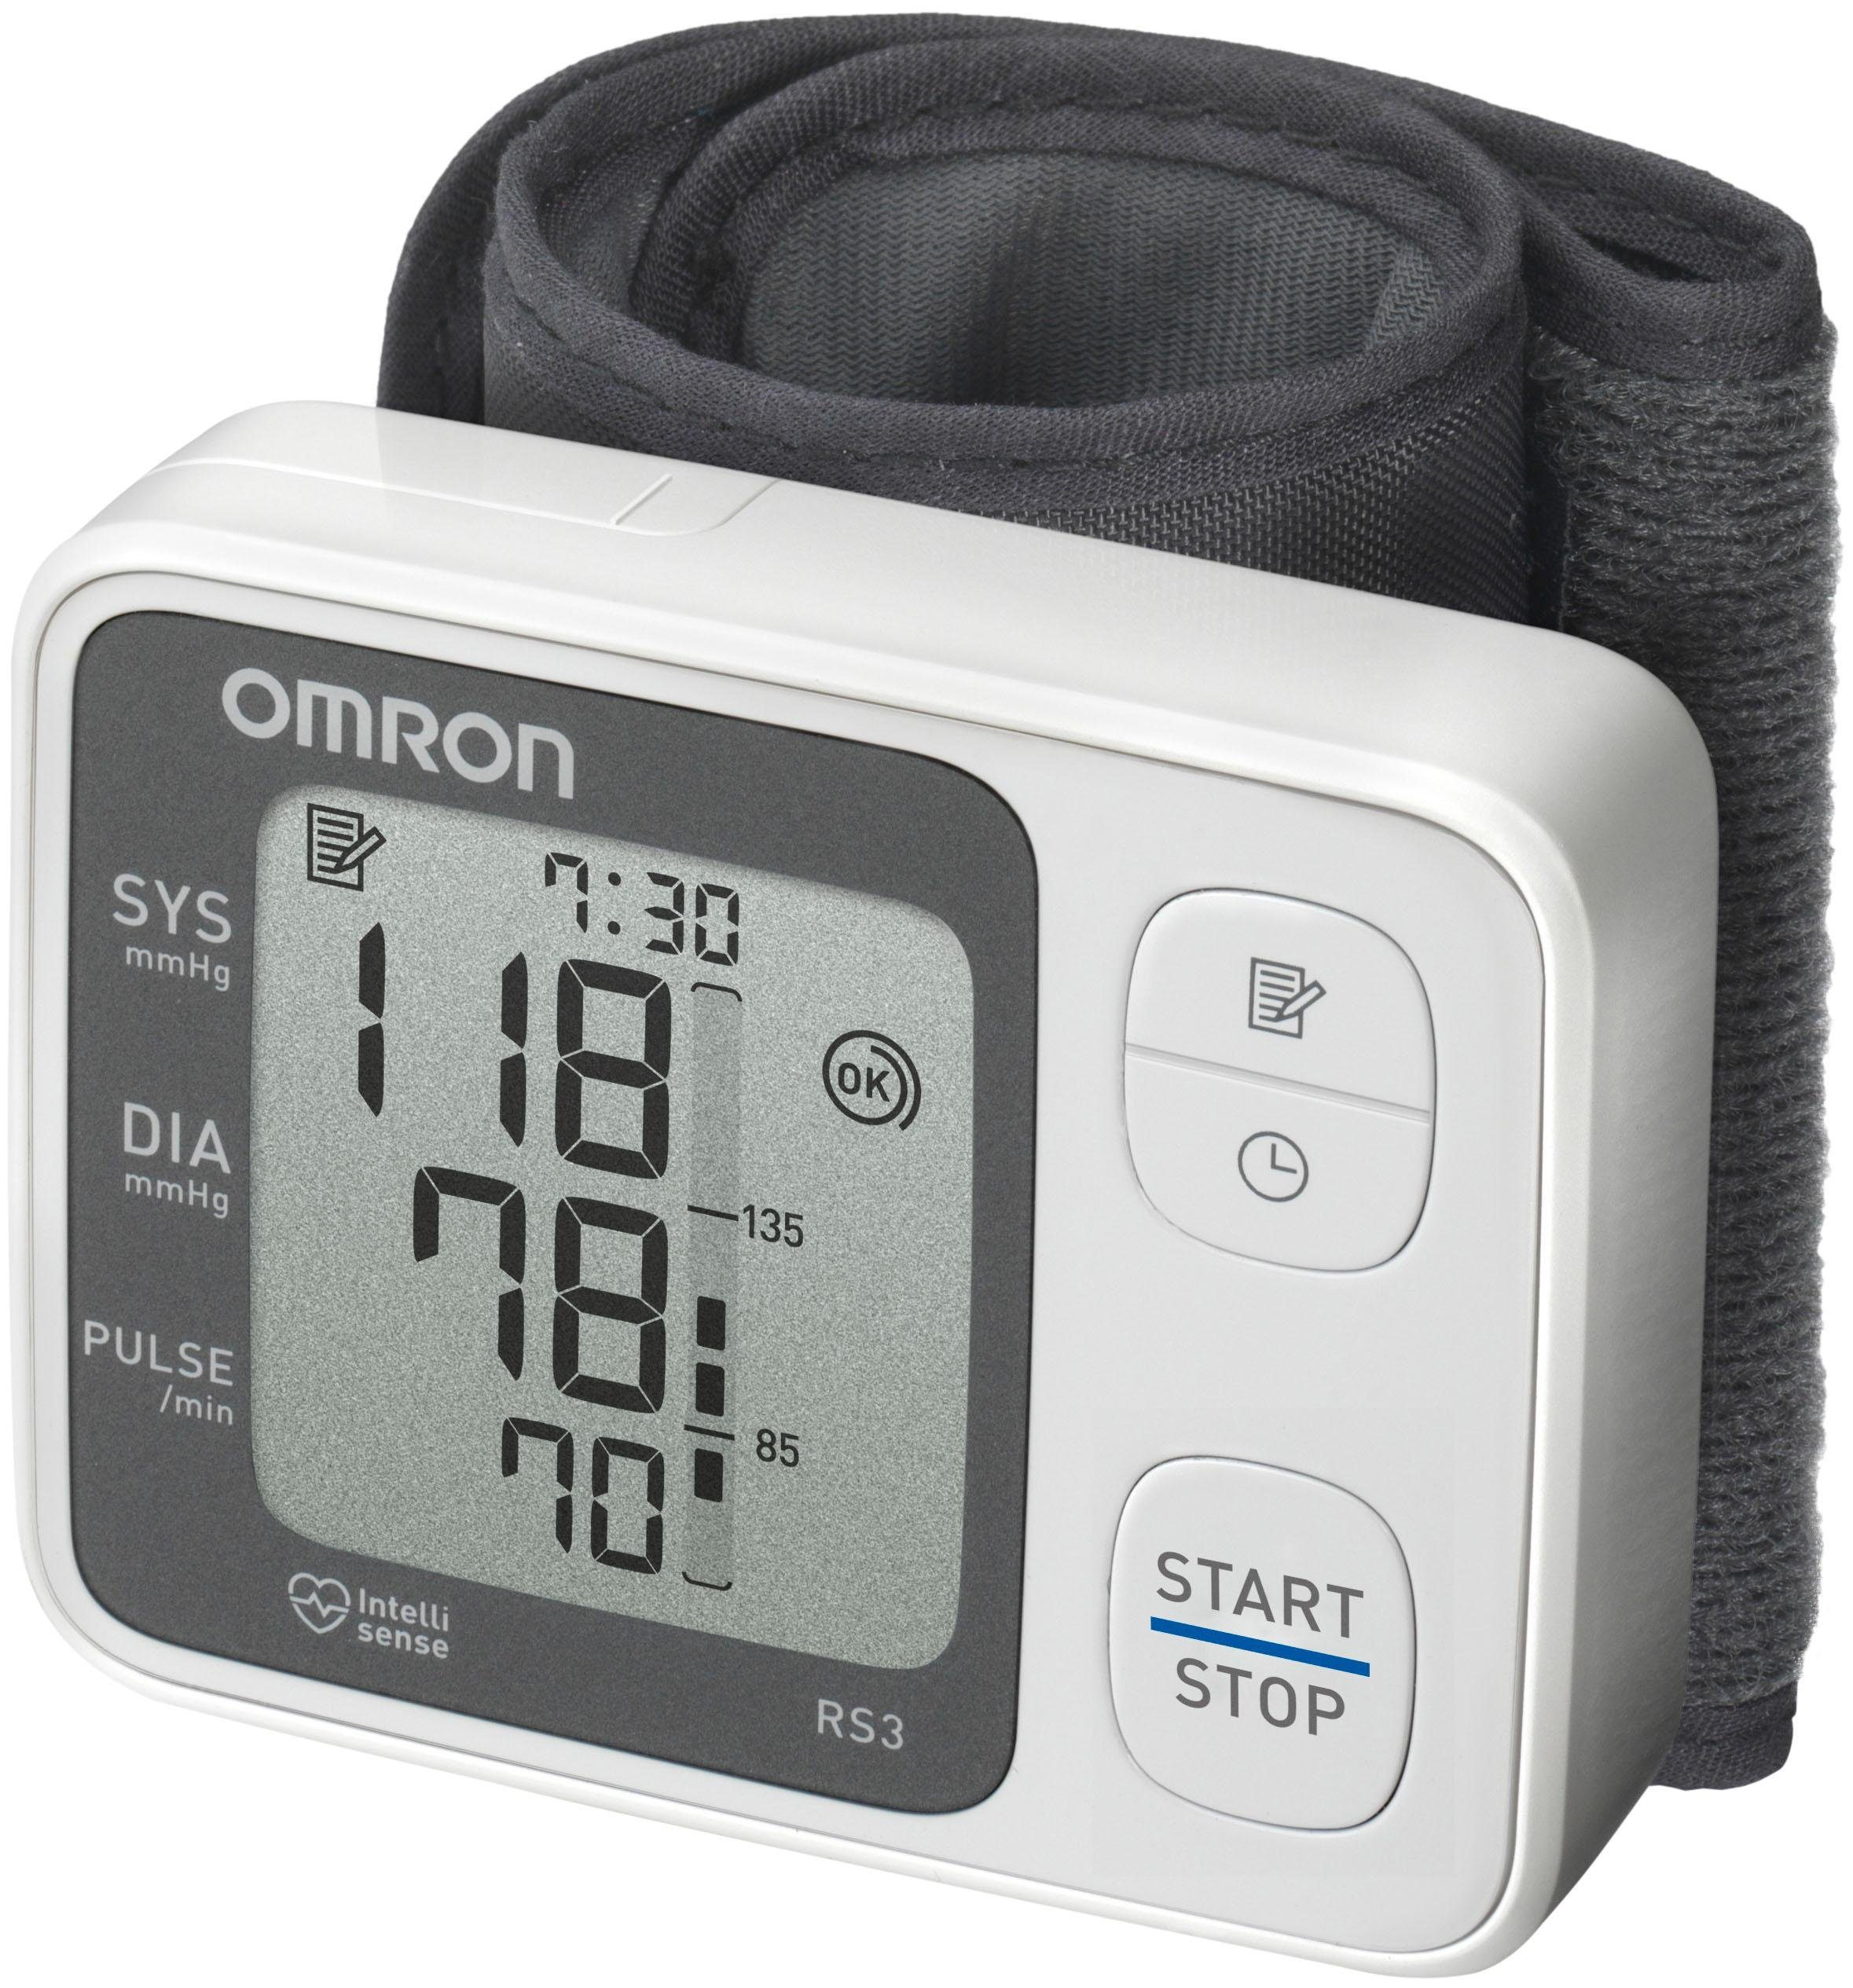 Omron Handgelenk-Blutdruckmessgerät RS3 (HEM-6130-D)